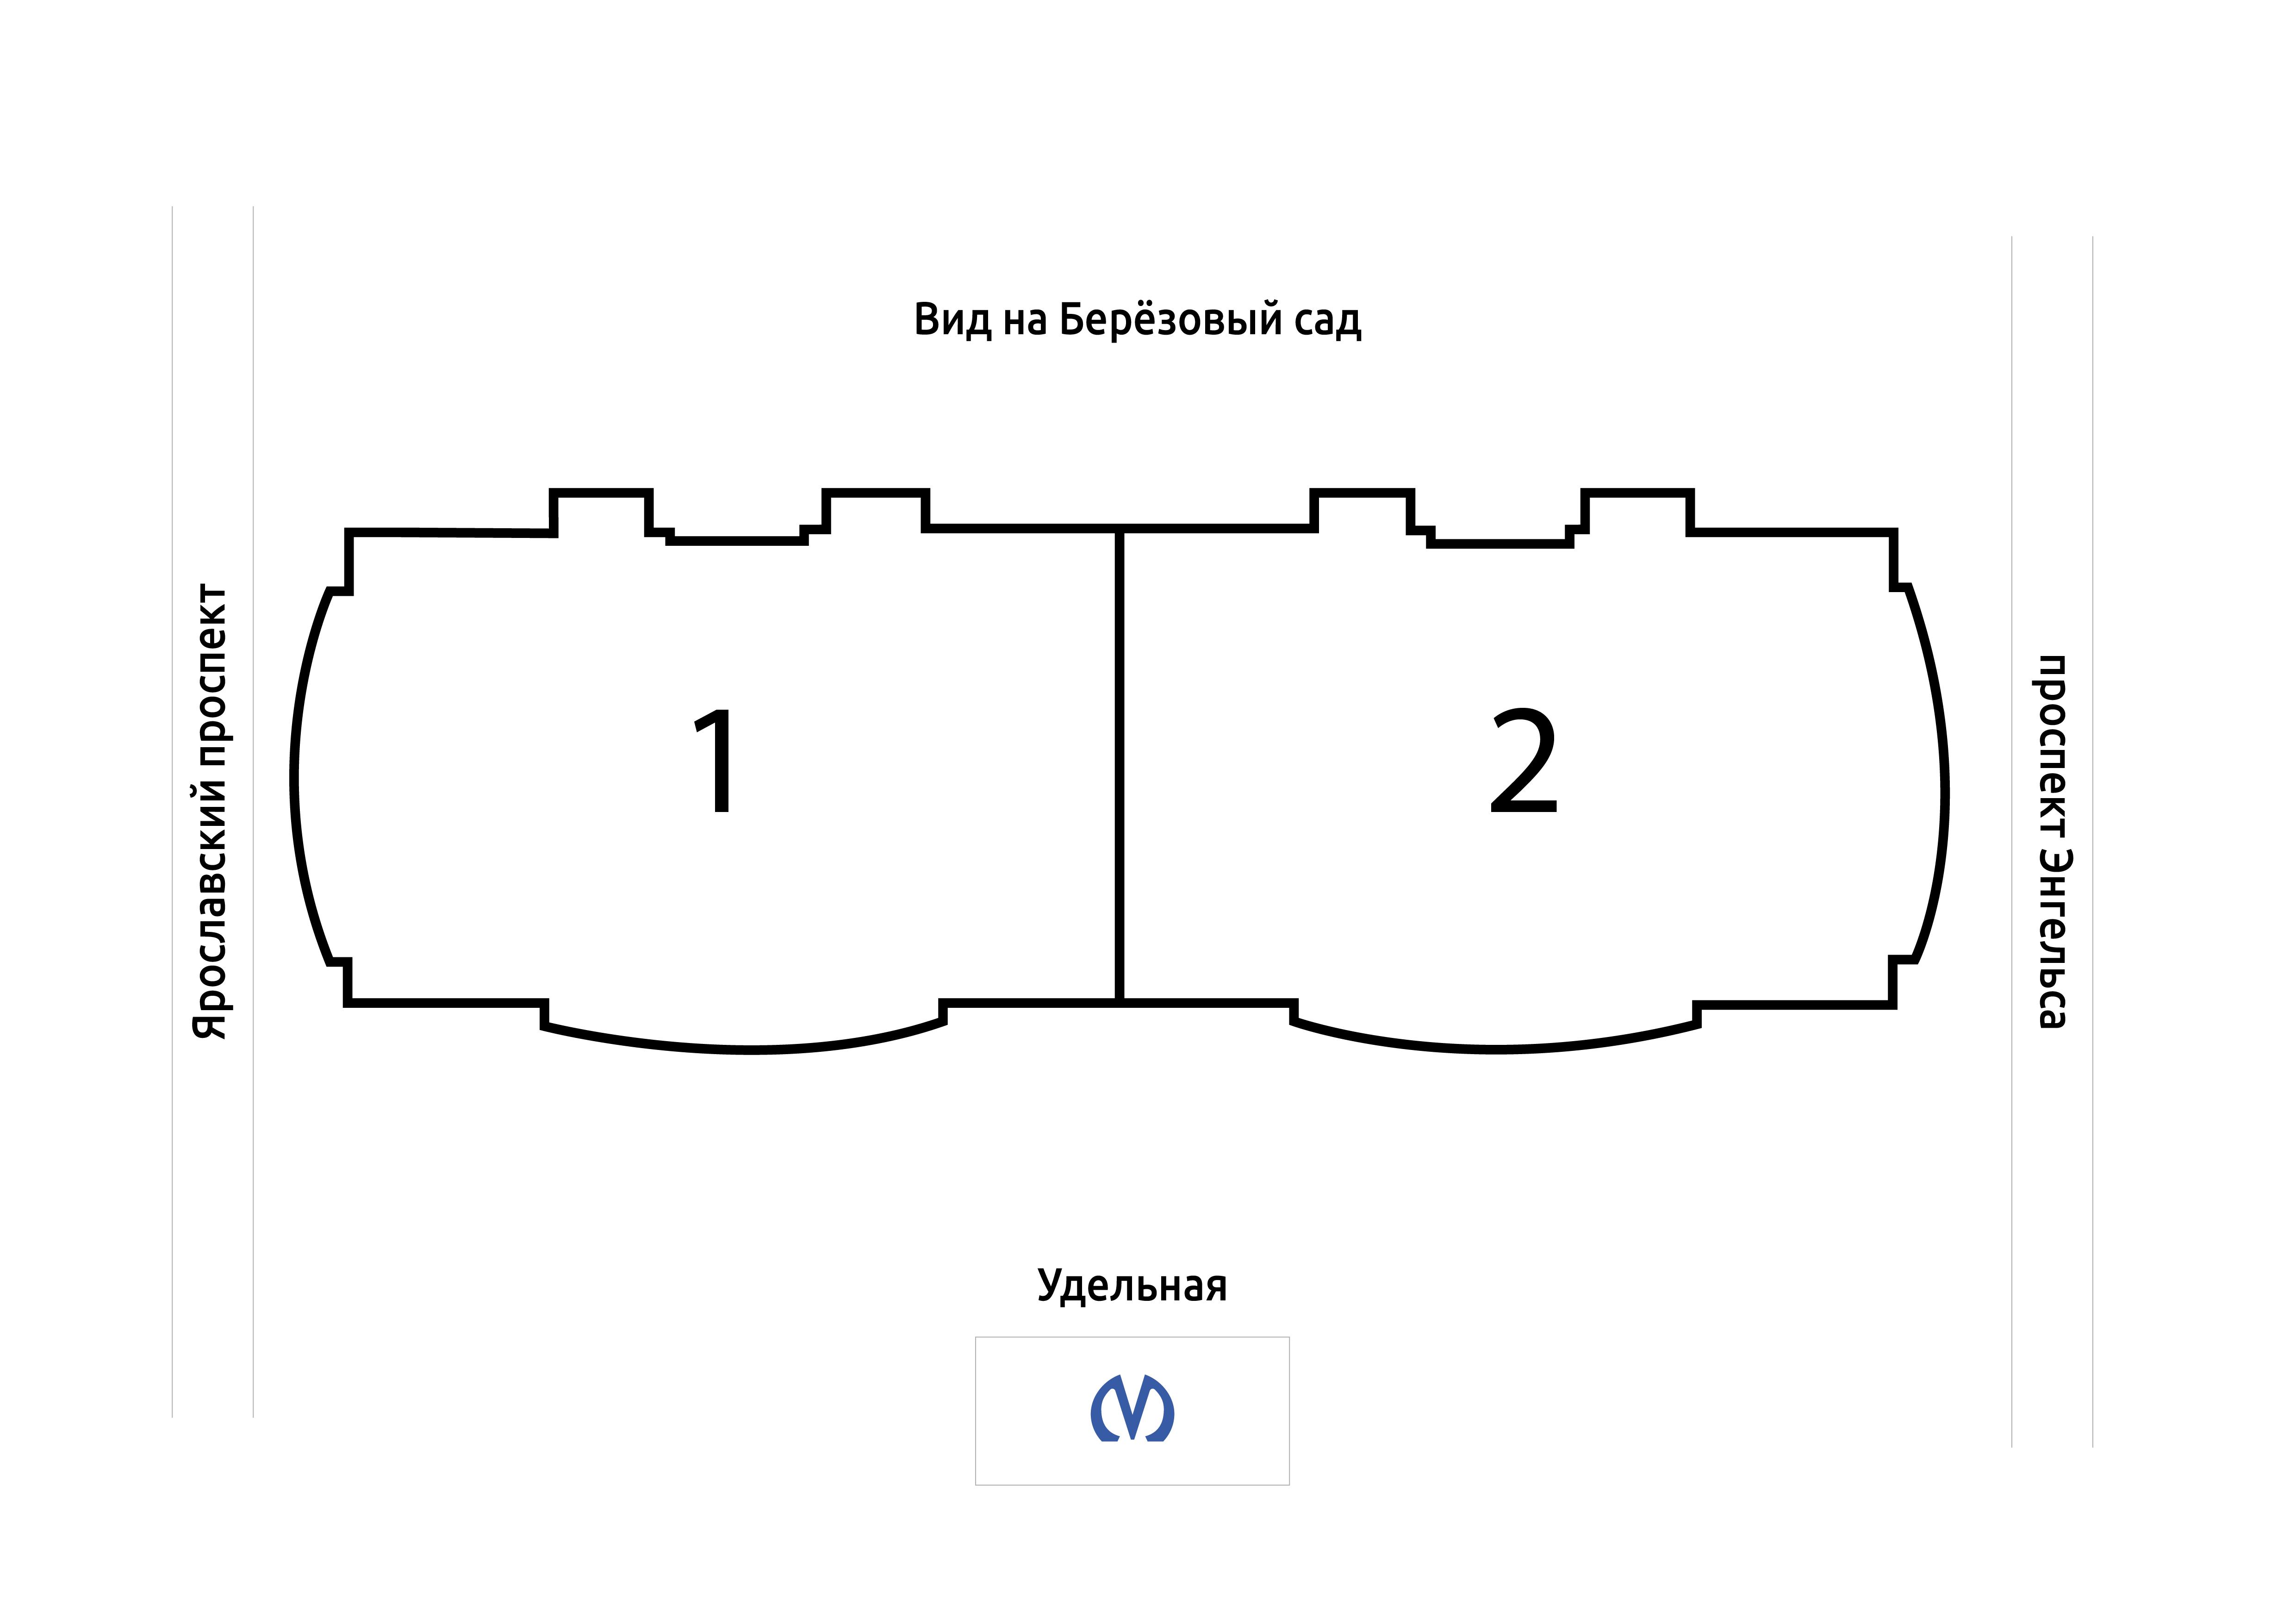 План жилого комплекса ЖК Дом у Березового сада